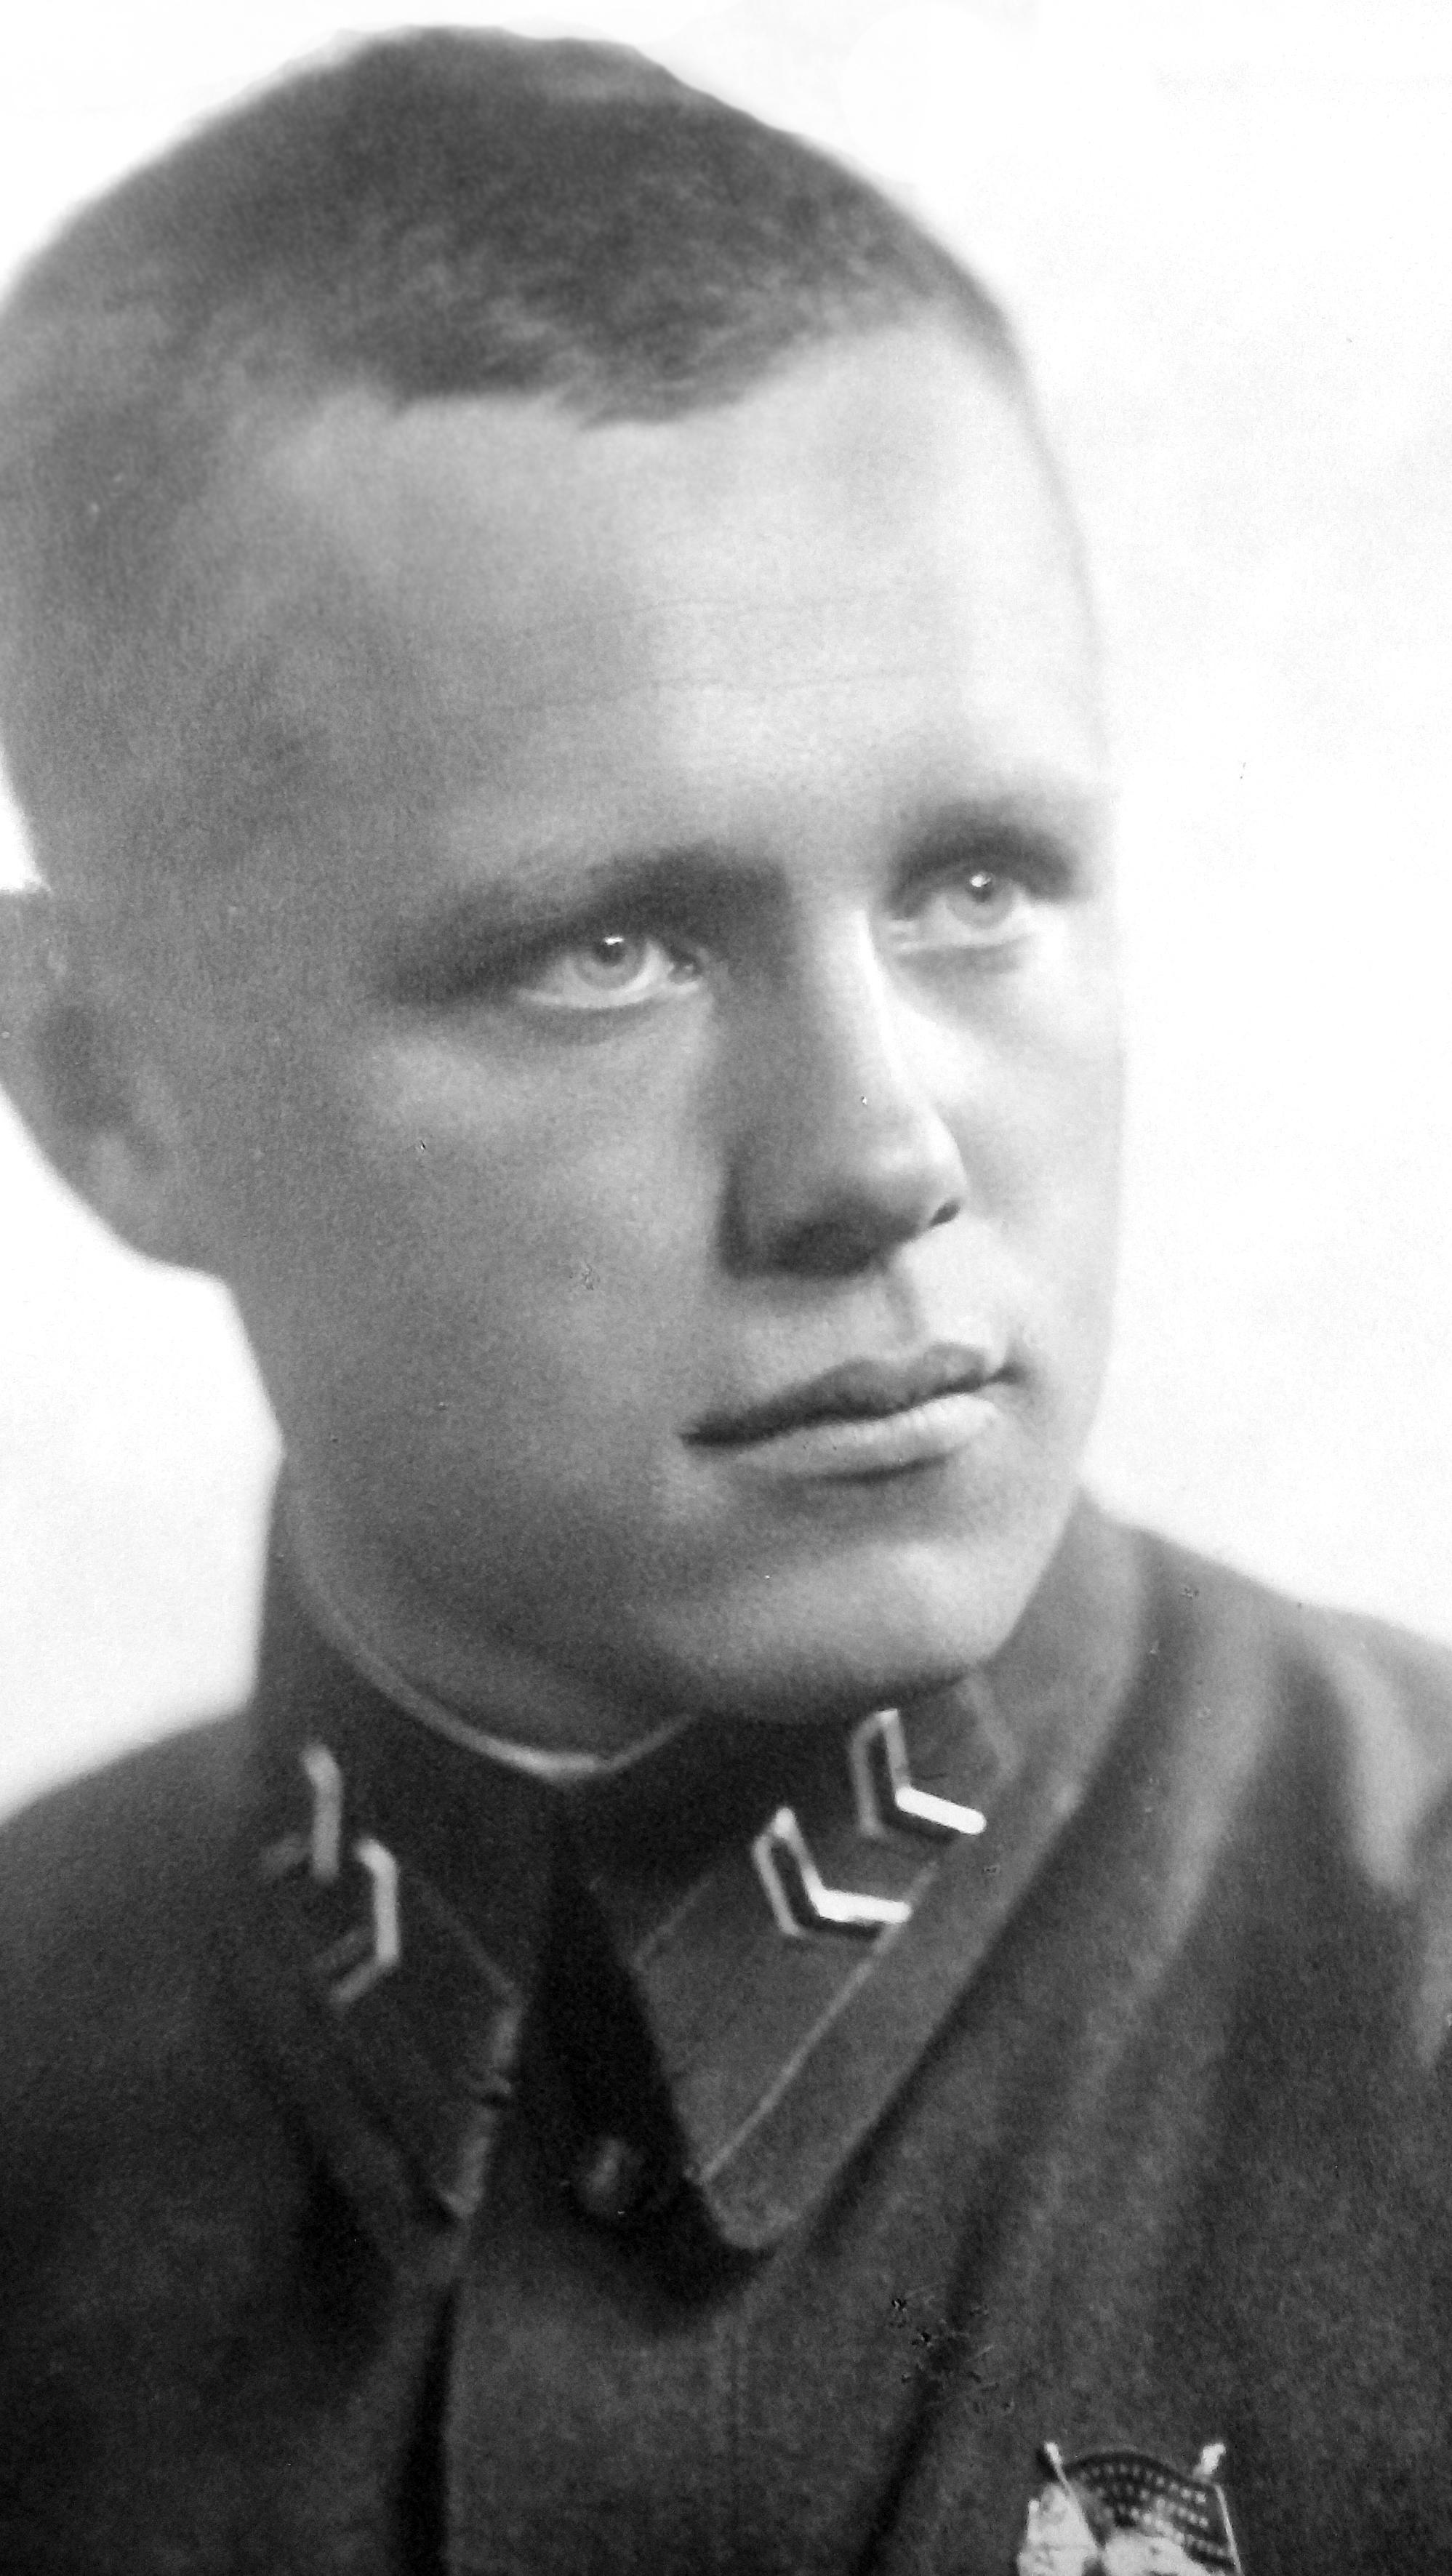 Войска ЧОН - ОГПУ - НКВД - ВВ МВД. ( 57 фото )